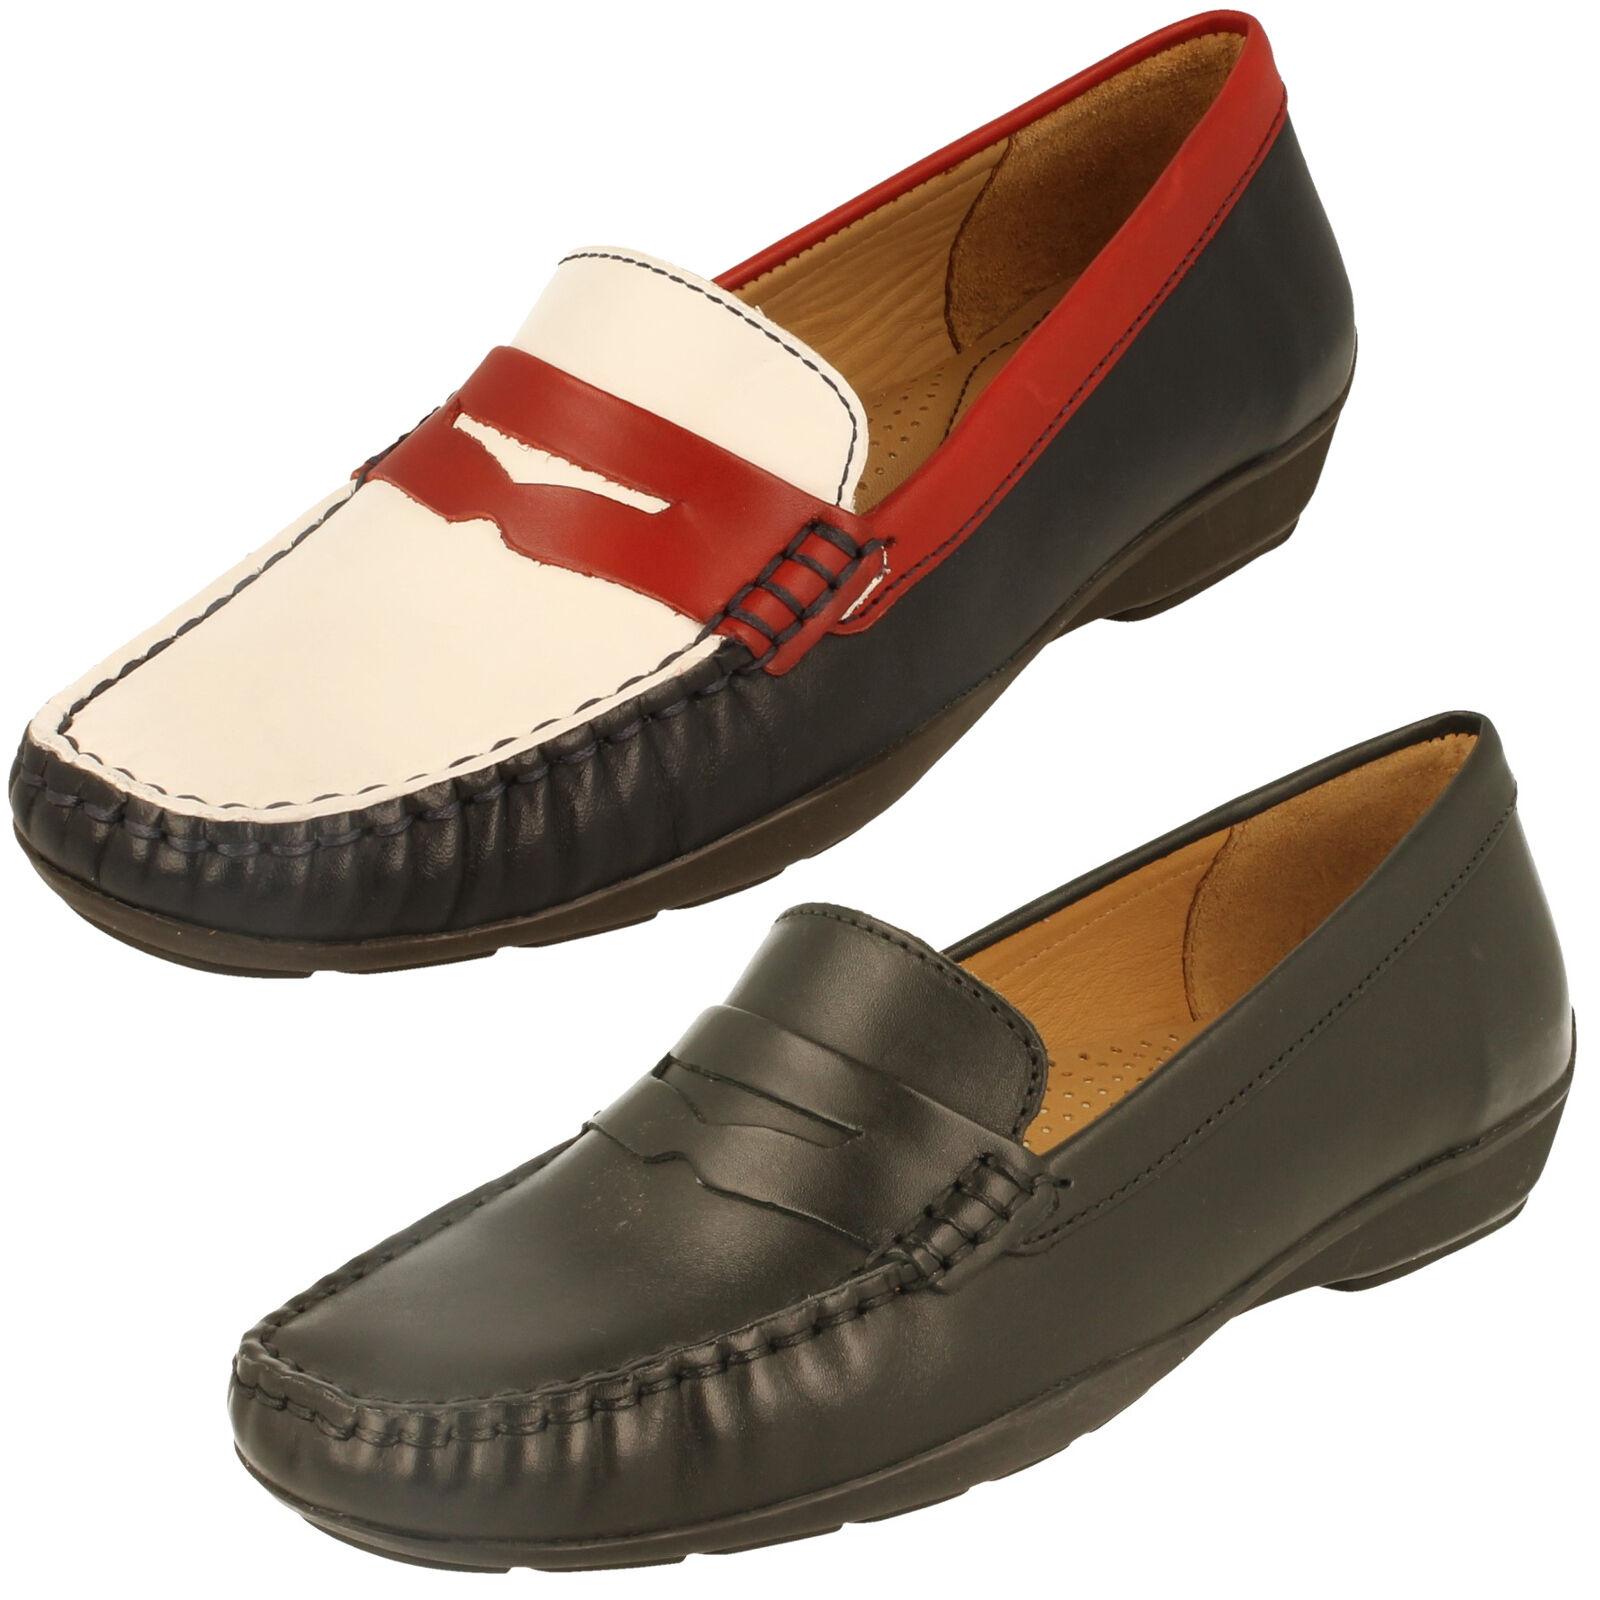 Ladies Globo shoes - Aslockton